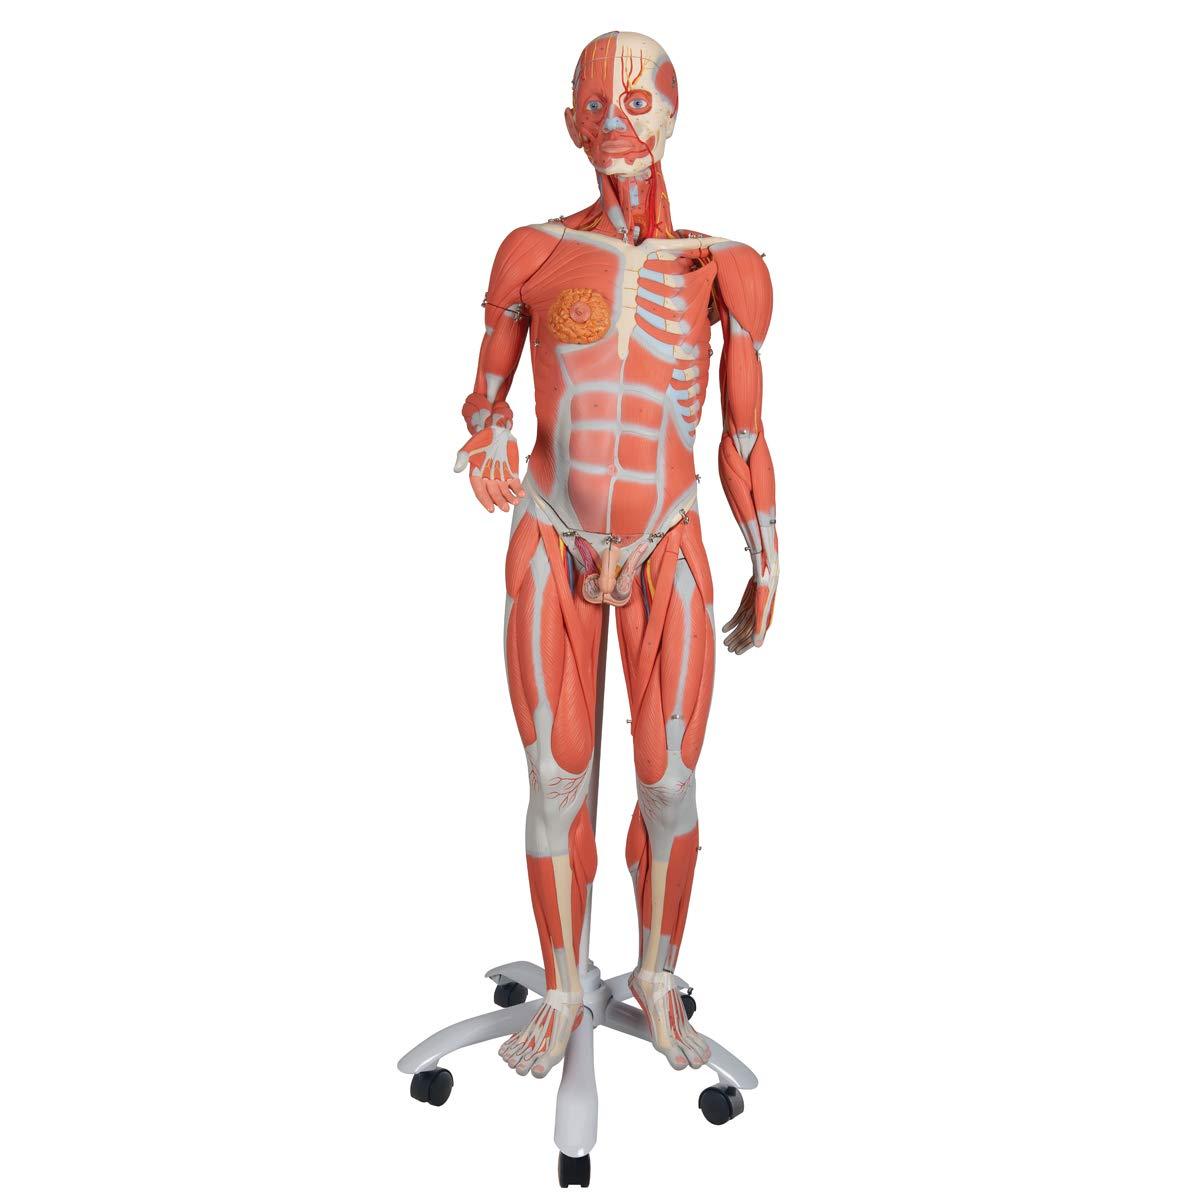 3B Scientific B50 45 Part 3 4 LifeSize Dual Gender Muscle Figure Model, 54.3Inch X 19.7Inch X 12.6Inch